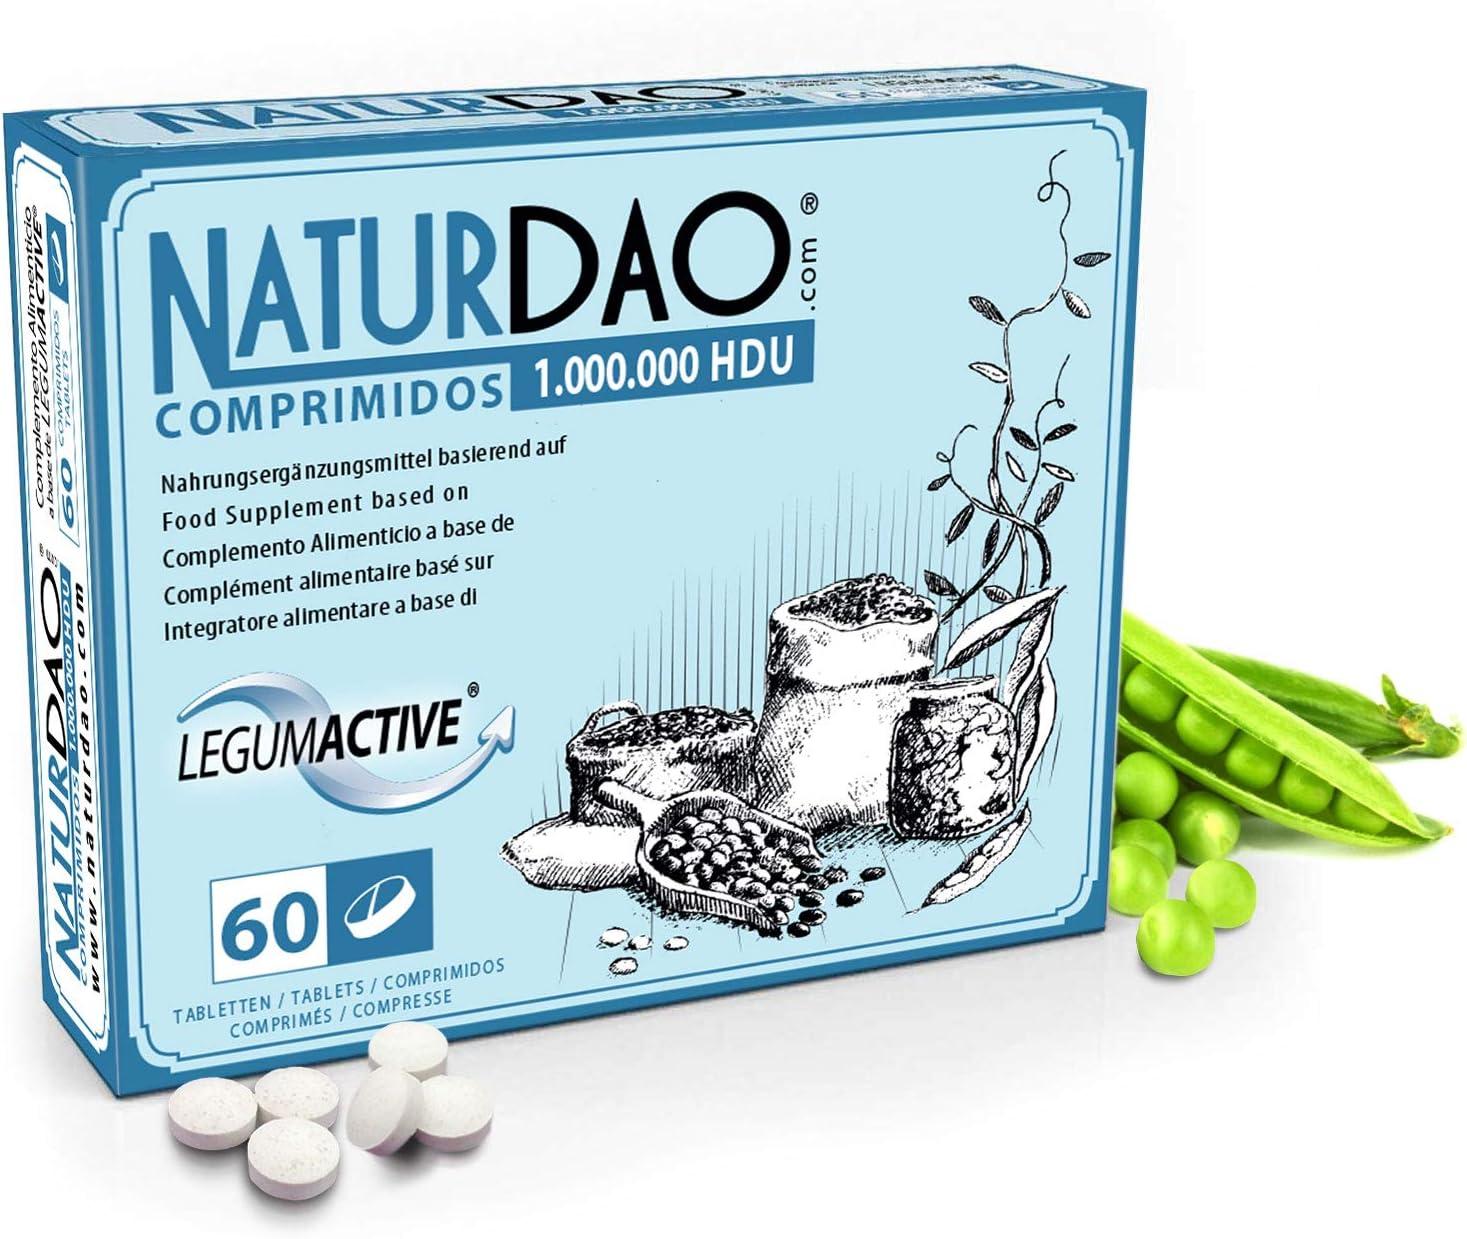 NATURDAO - 60 Tablets 1 Deficiency Ranking integrated 1st place Atlanta Mall DAO HDU Histami 000